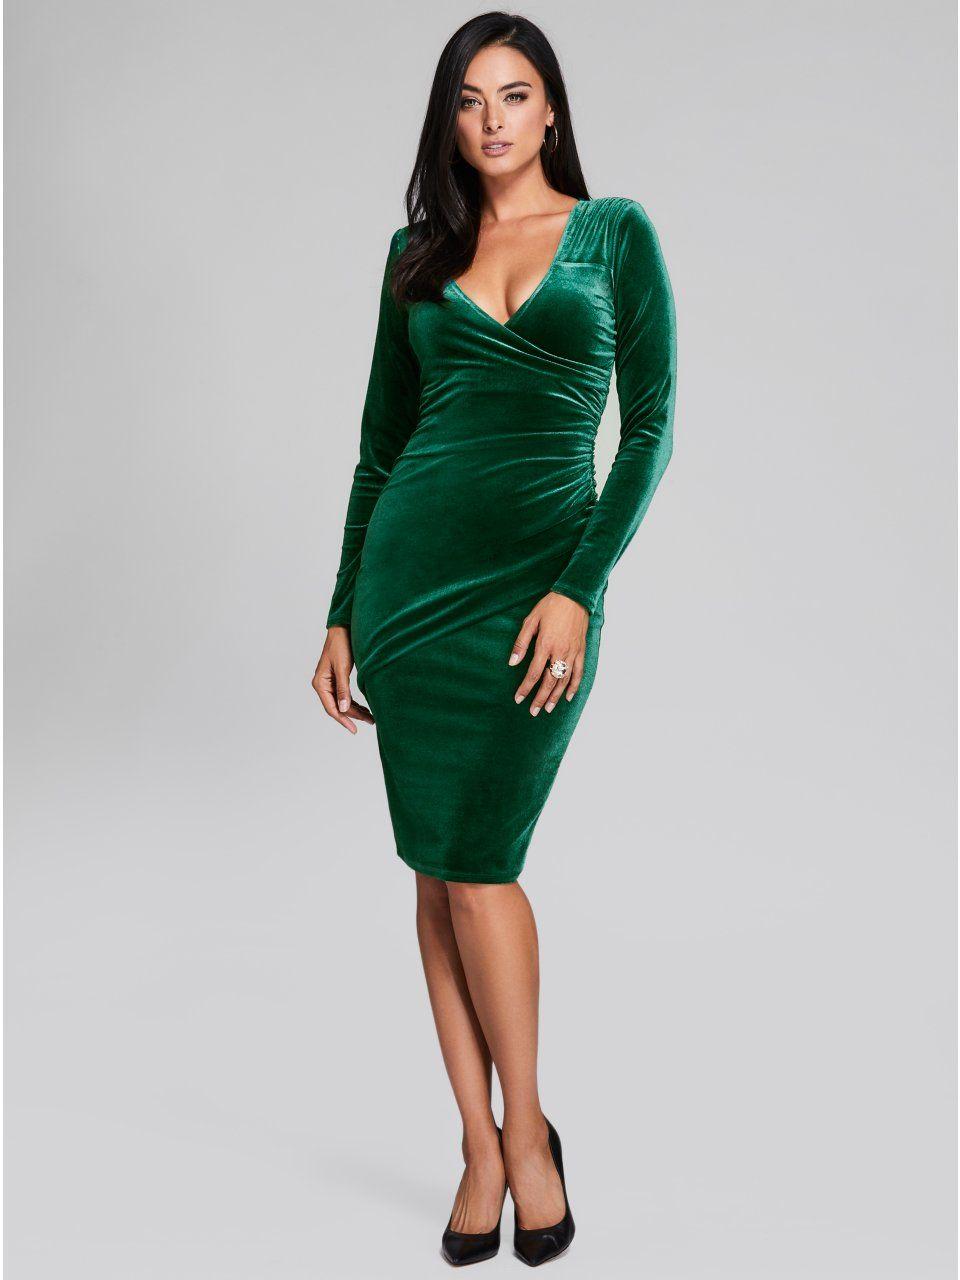 b63bf0101e Theana Velvet Midi Dress   Products in 2019   Velvet midi dress ...